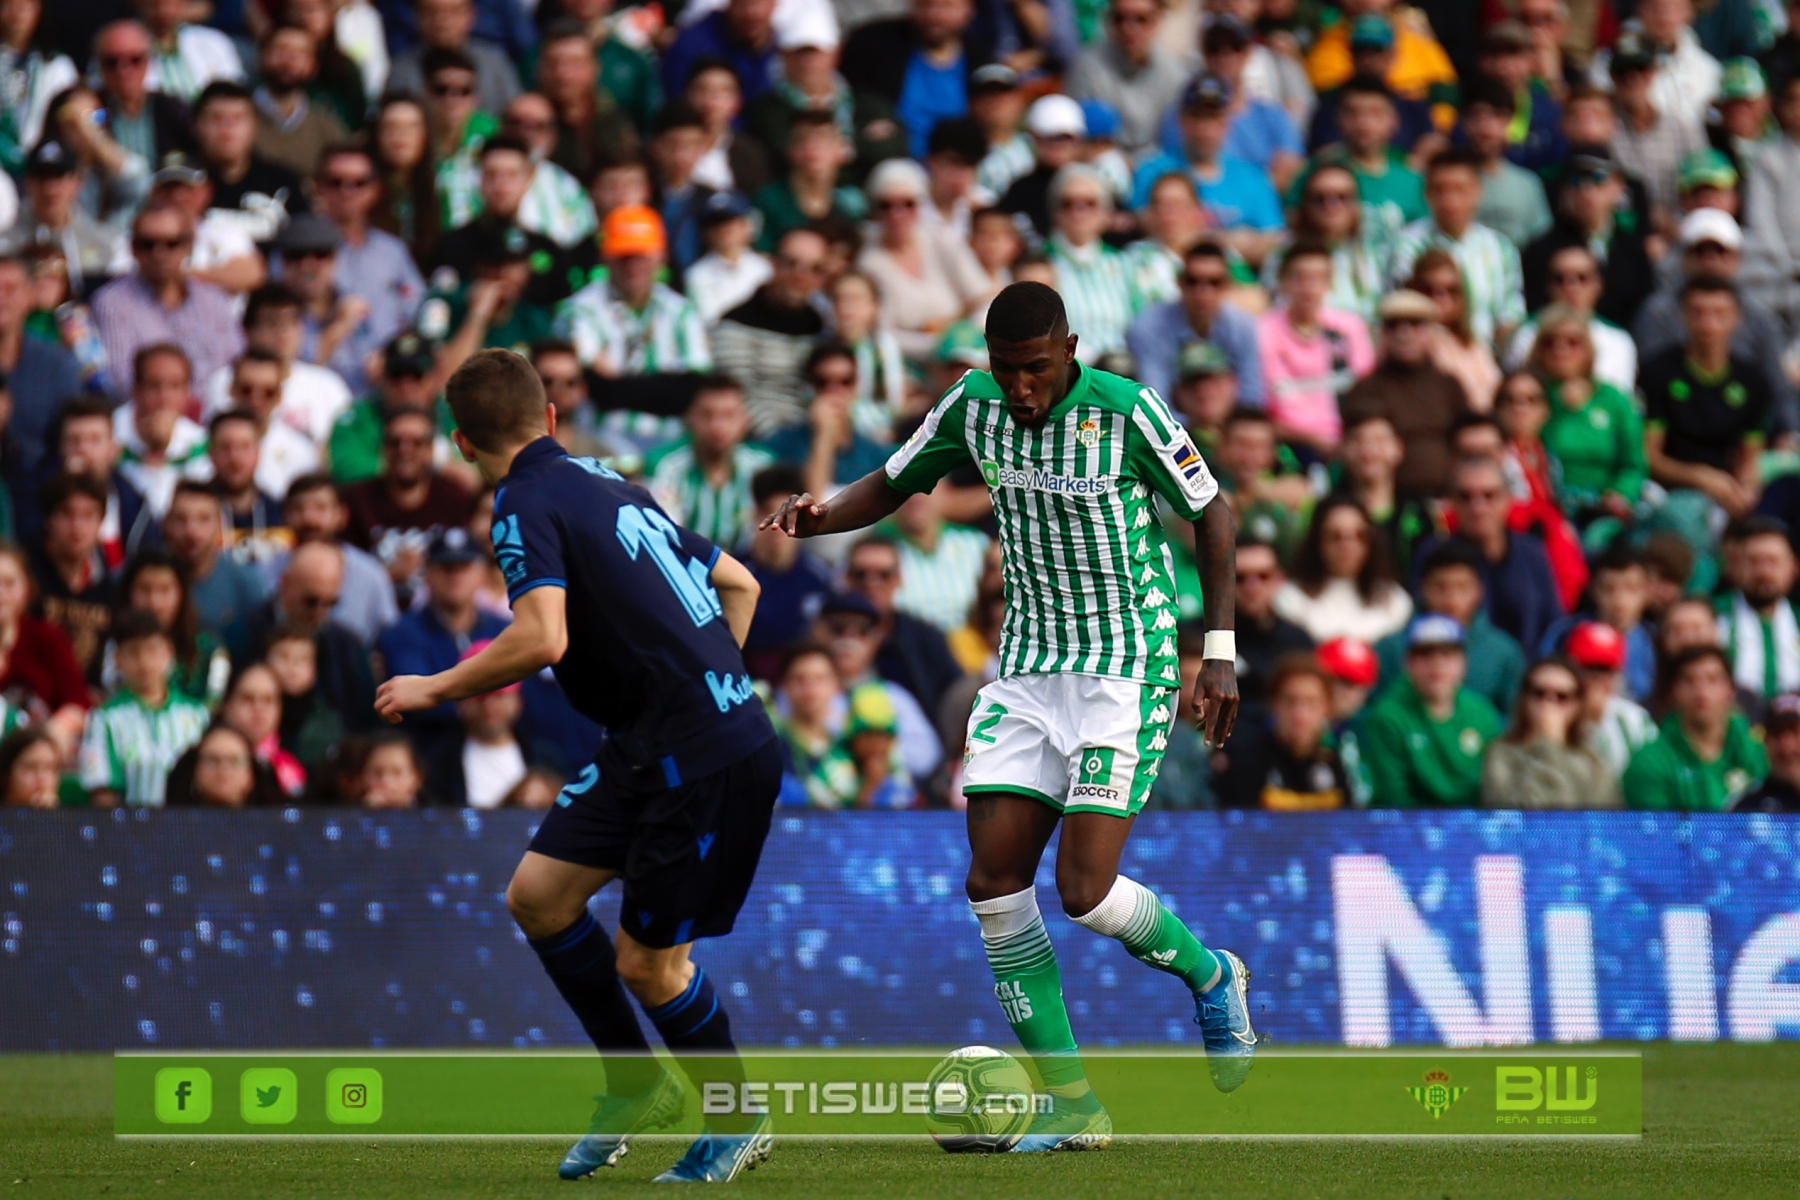 J20 Real Betis - Real Sociedad 40